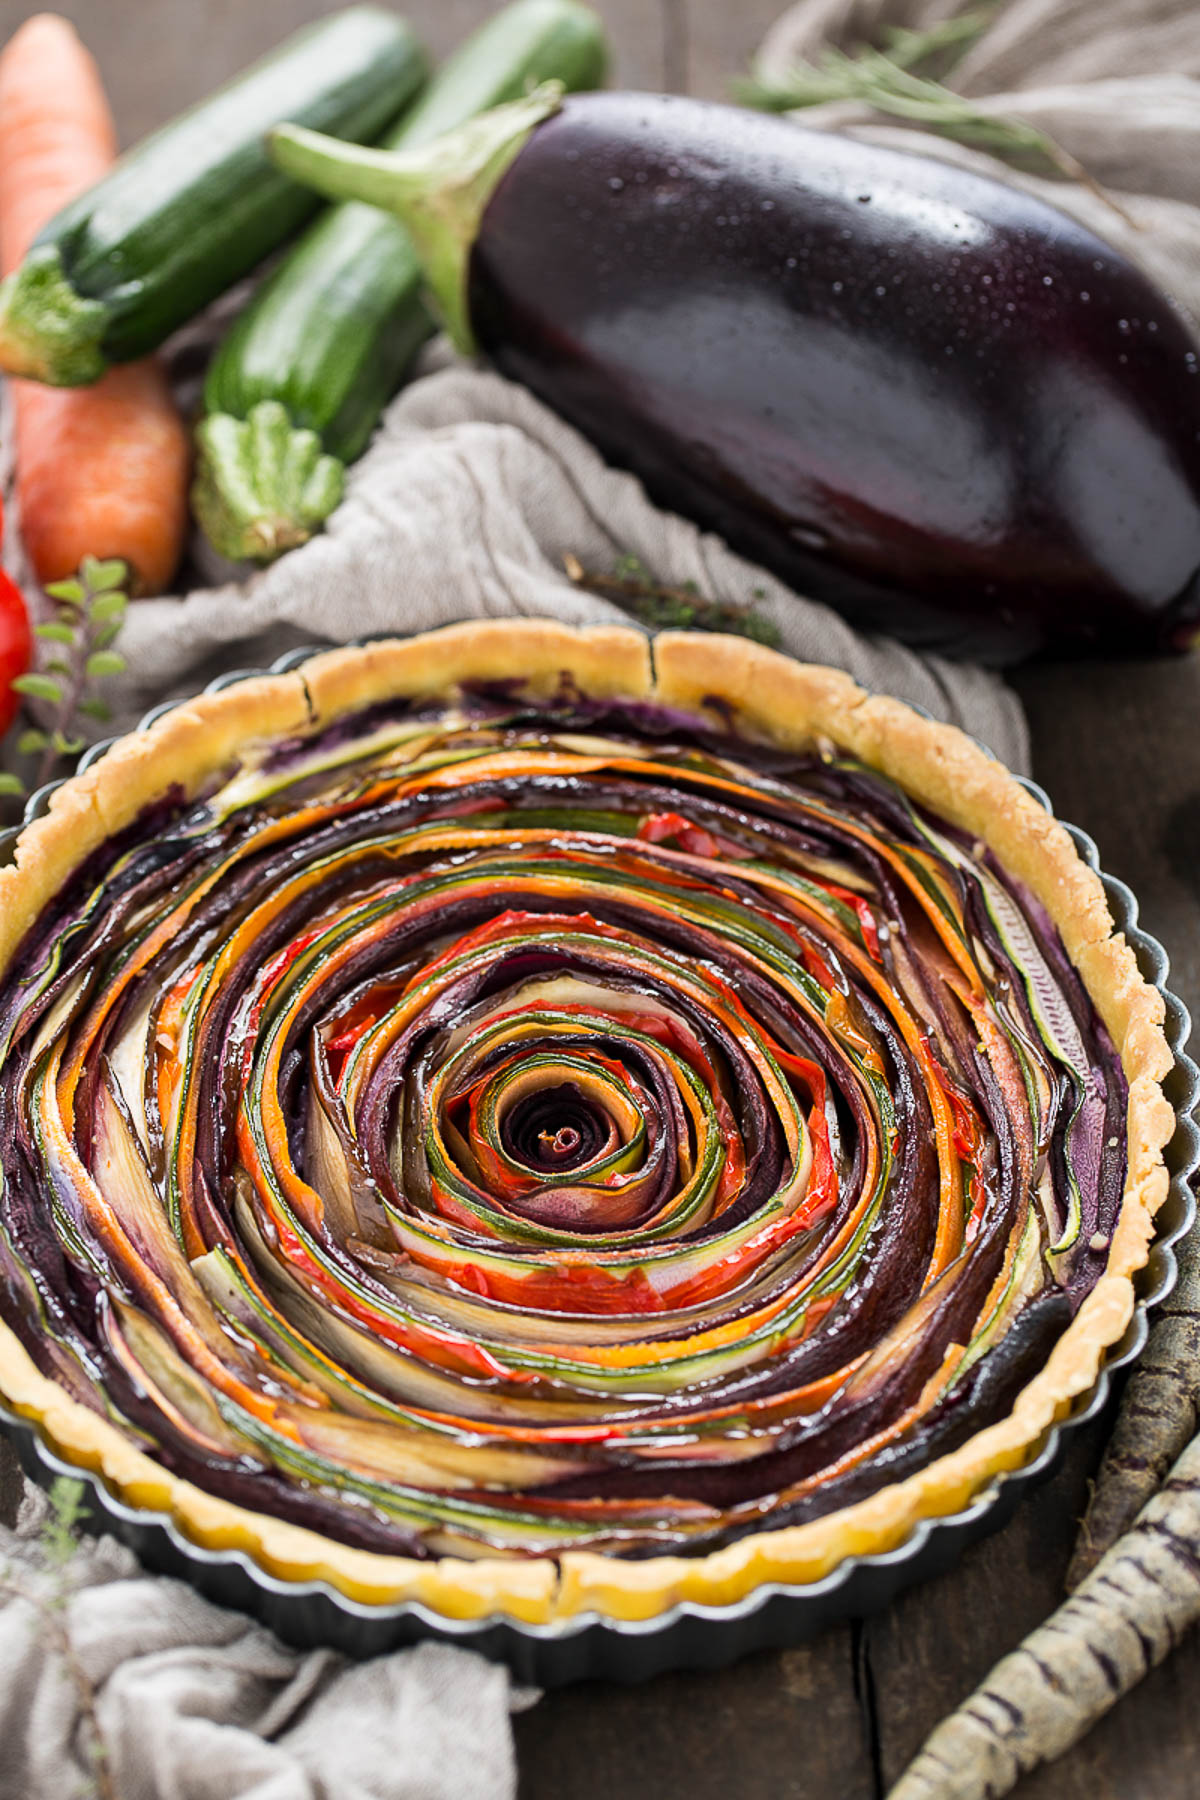 vegan #glutenfree vegetable spiral tart | torta salata di verdure a spirale senza glutine senza uova senza burro #vegan